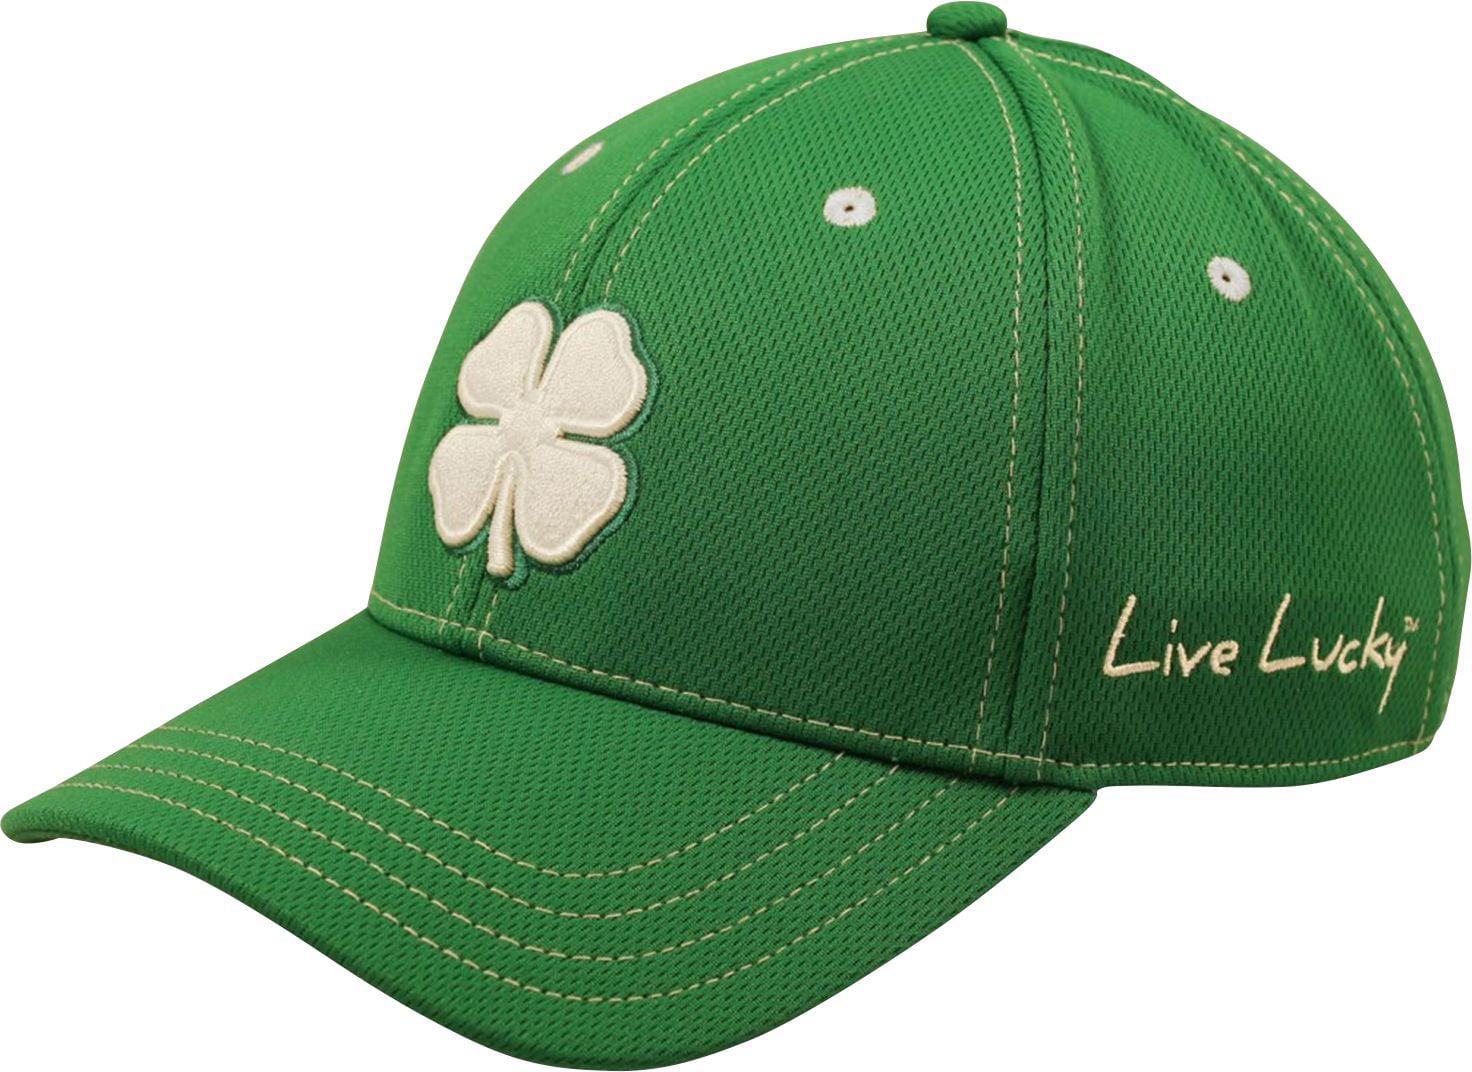 Black Clover Men's Premium Clover Golf Hat - Walmart.com